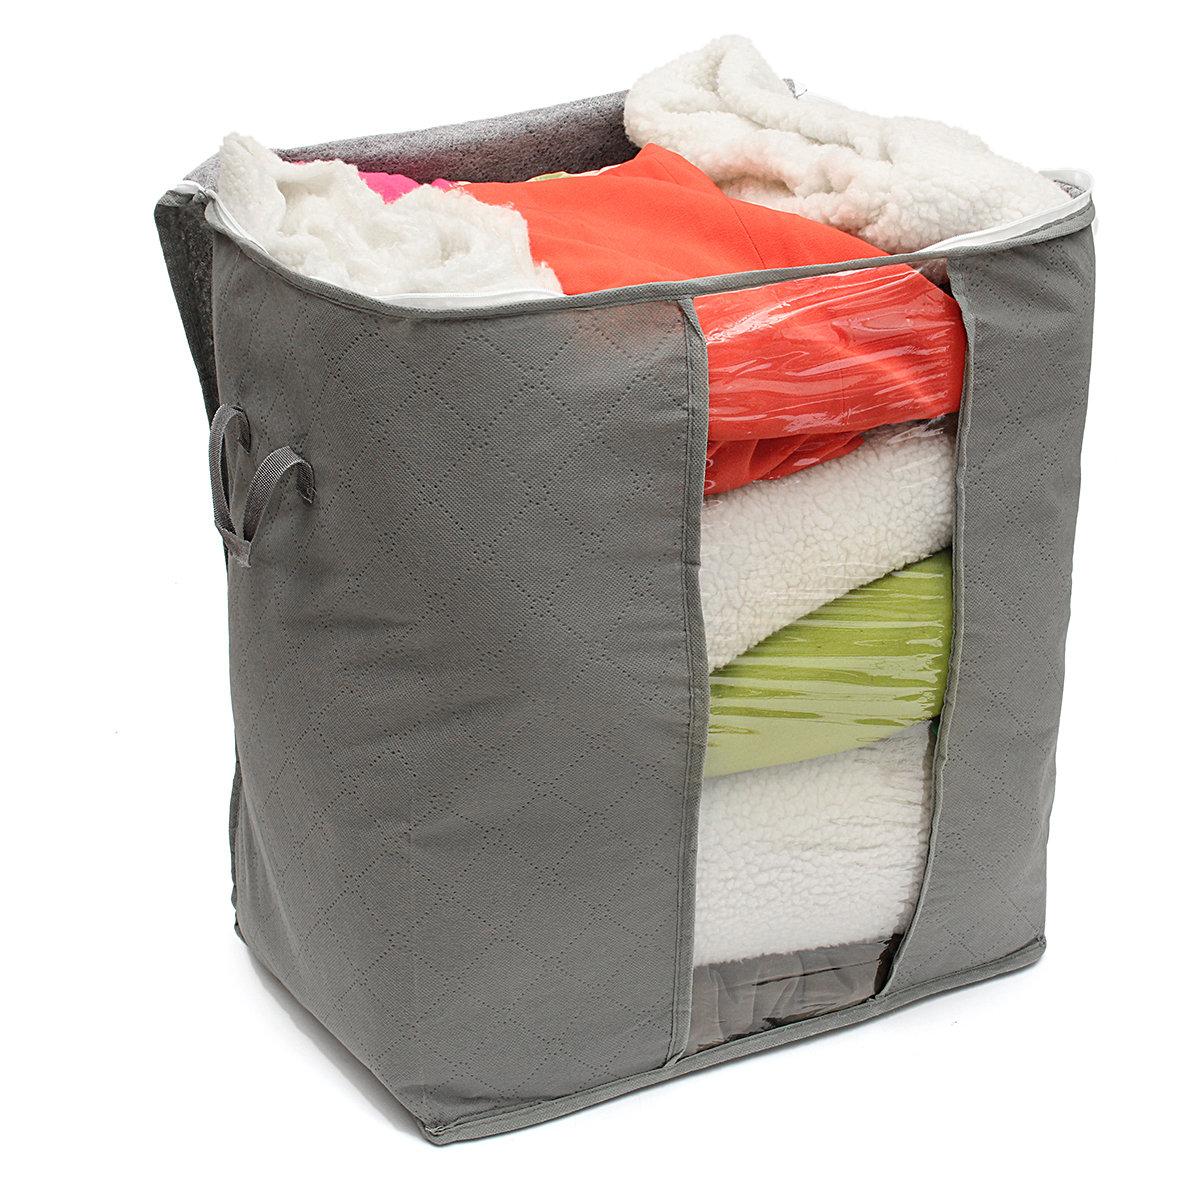 Foldable Bamboo Charcoal Storage Bins Clothes Blanket Closet Organizer Bag Case